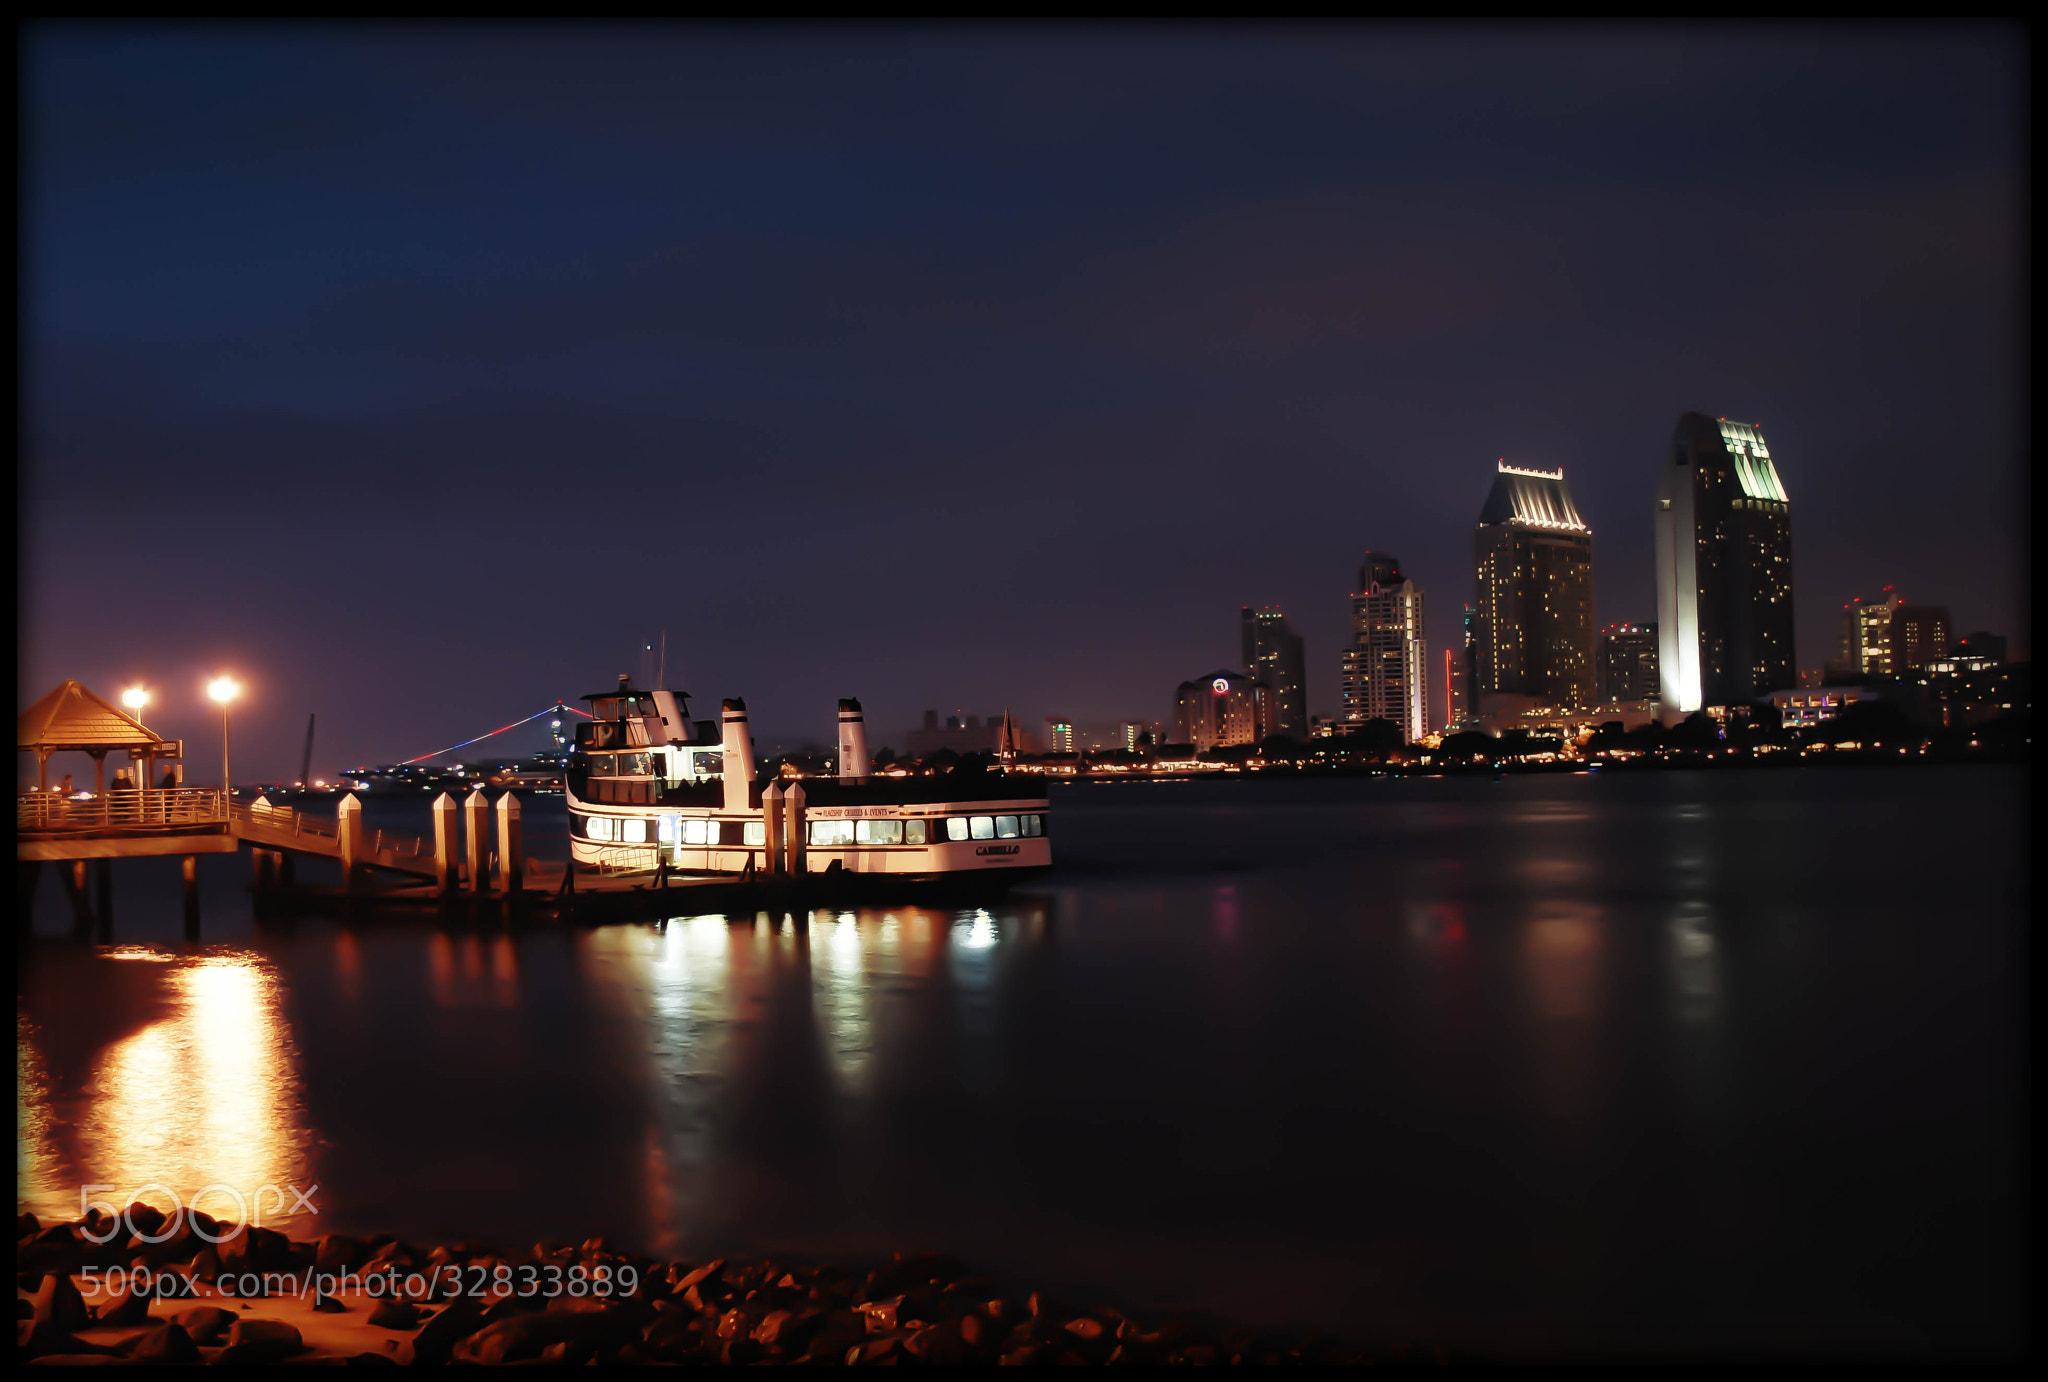 Photograph Night Sailing... by Manigandan Govindasamy on 500px